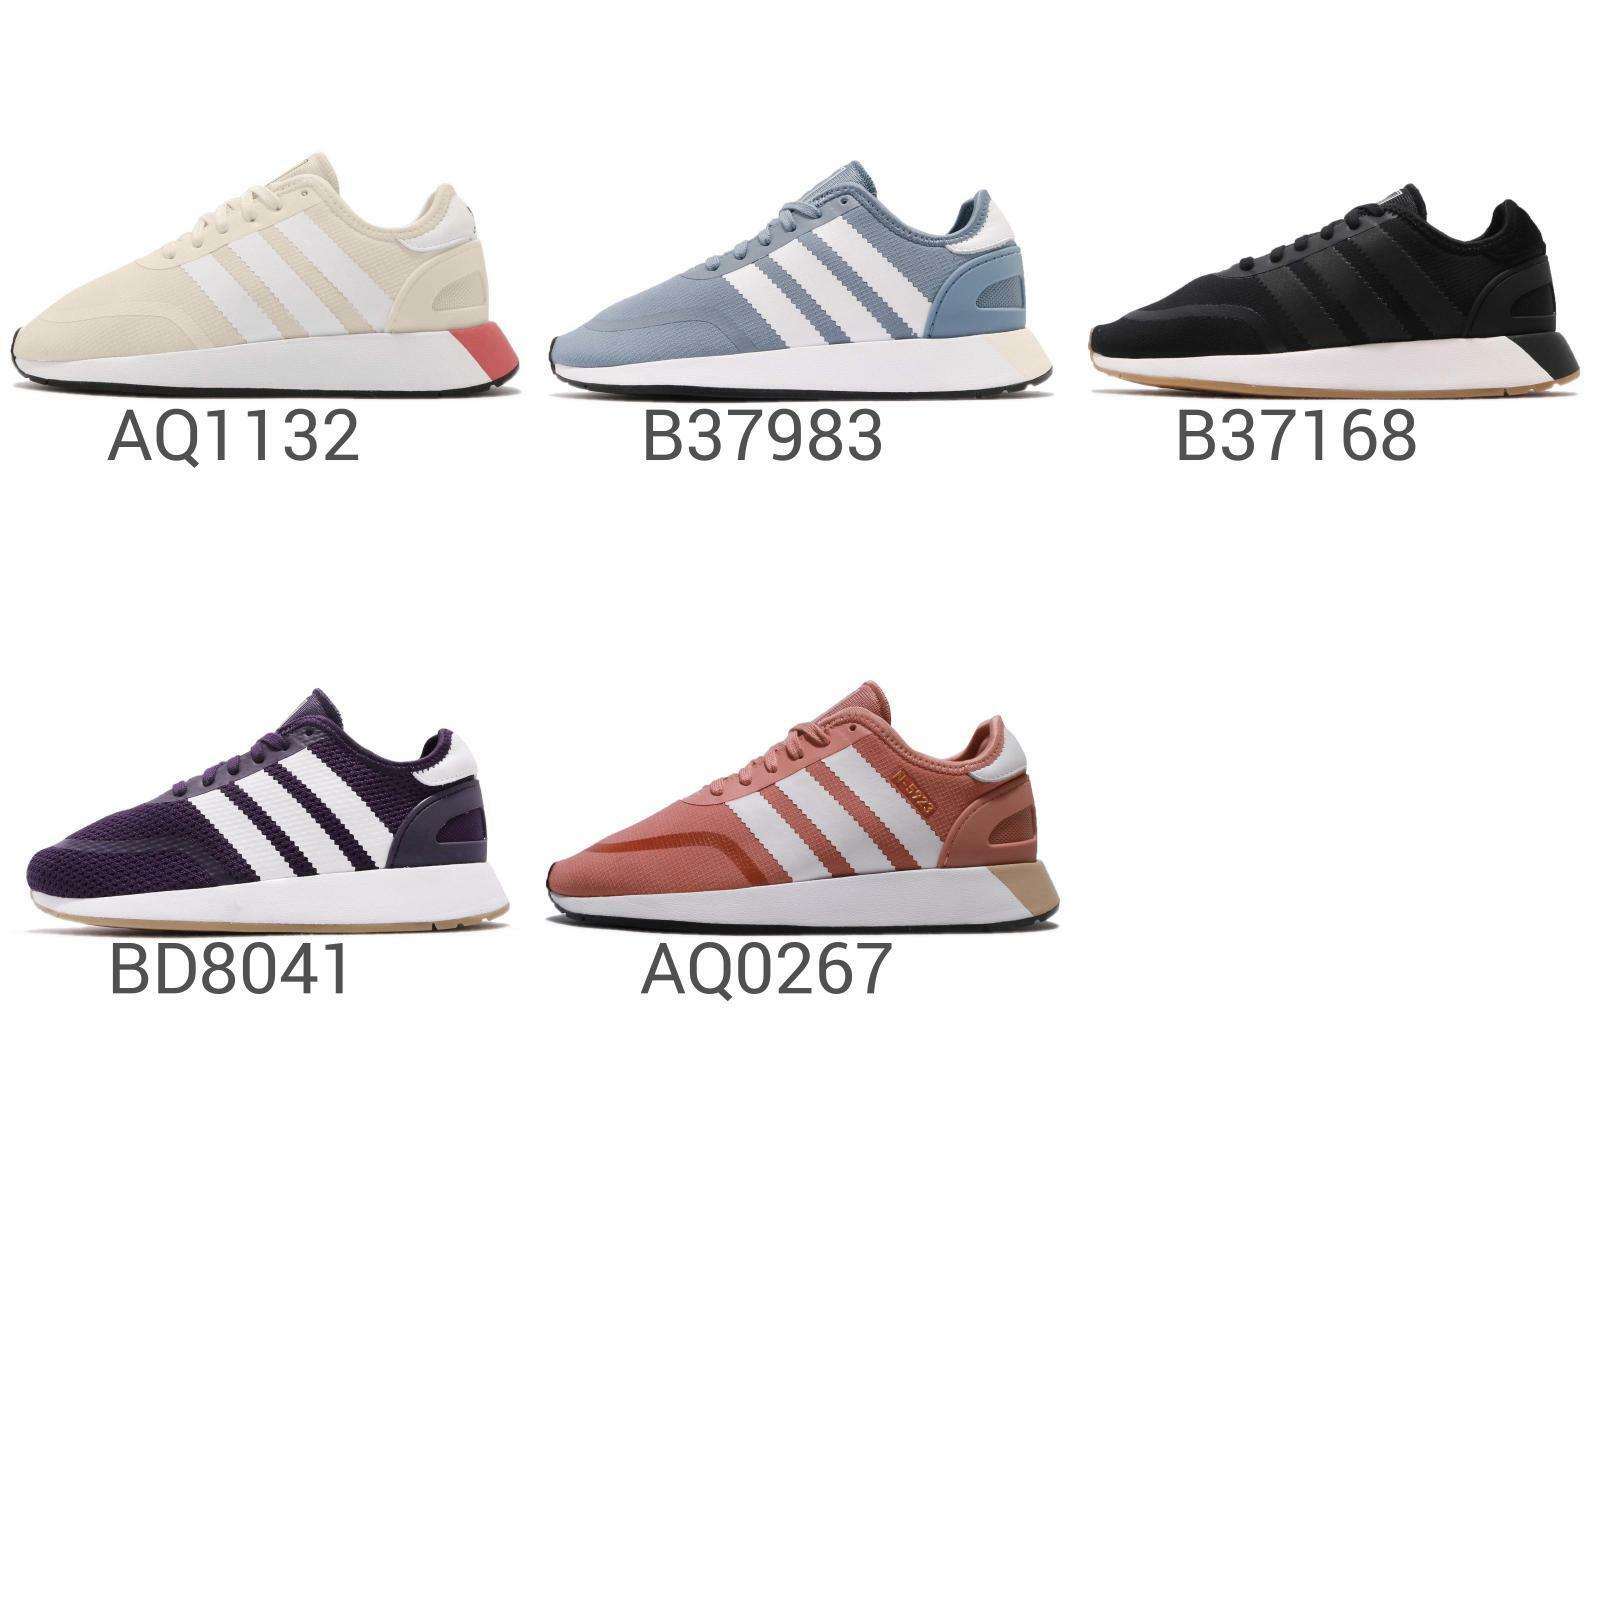 Adidas Originales Originales Originales N-5923 W Iniki Runner Boost para mujeres Zapatos Tenis para Correr Elija 1  sin mínimo